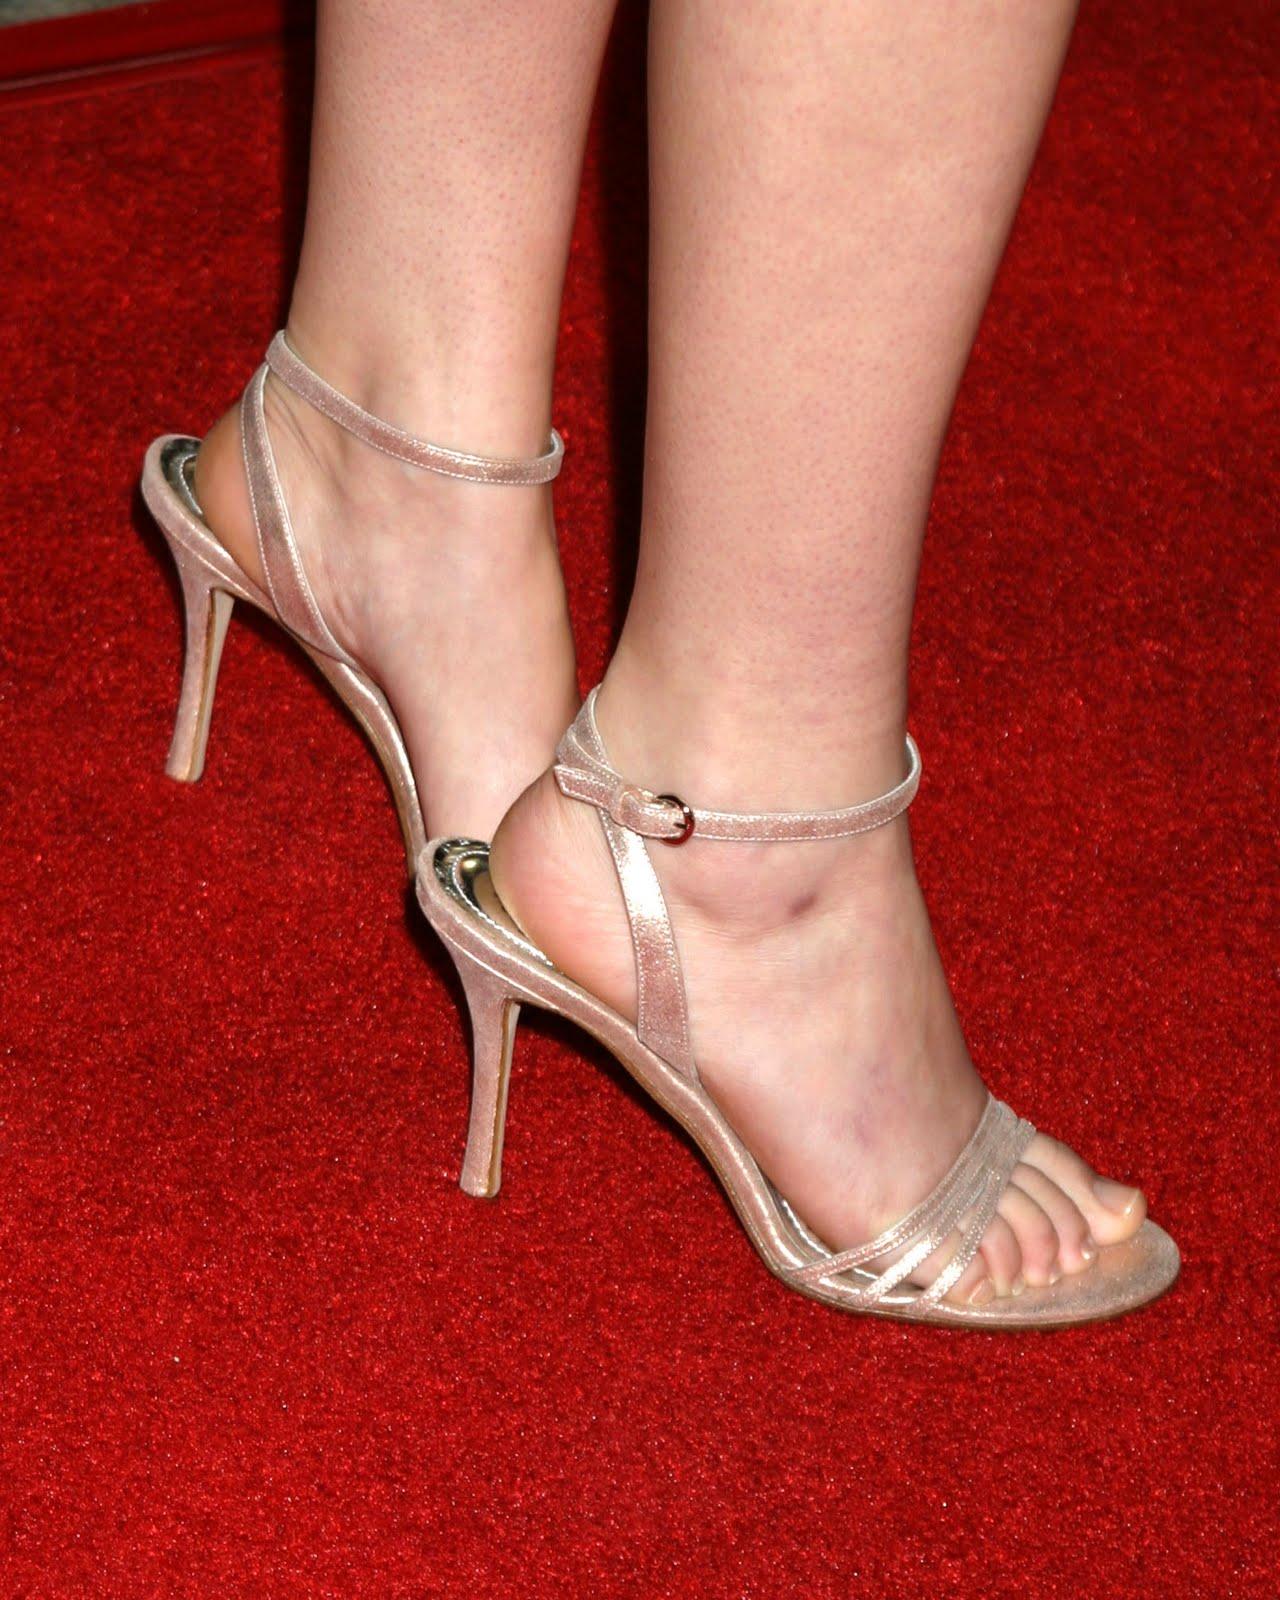 http://2.bp.blogspot.com/_bQ0SqifjNcg/TDVneY5R4sI/AAAAAAAAXpg/TB6C3Dgdyjk/s1600/laura-ramsey-feet.jpg